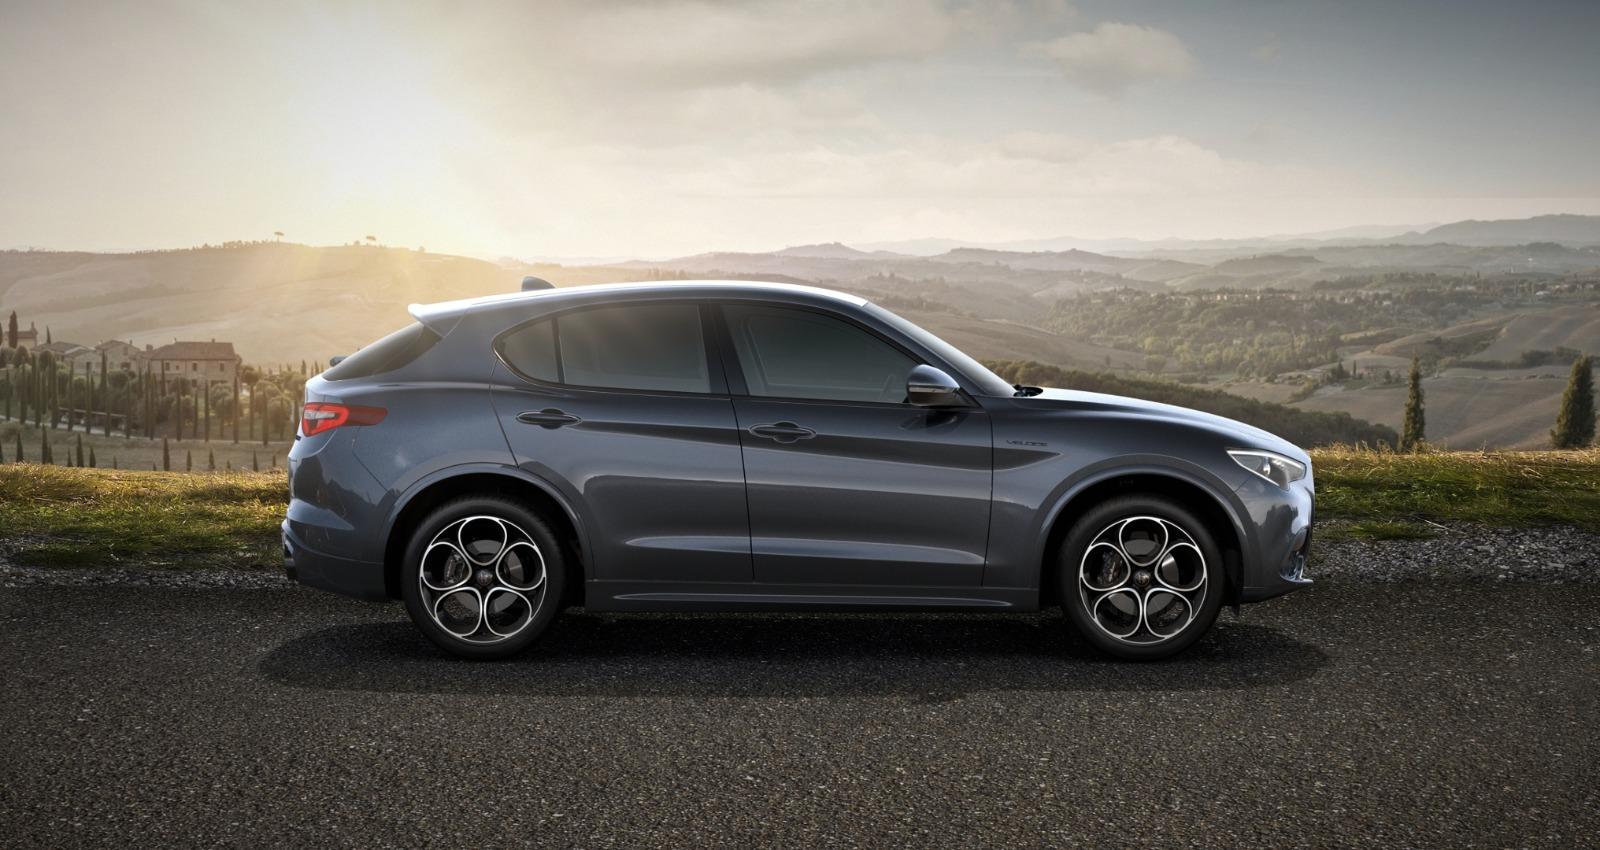 Renting Alfa Romeo Stelvio Plano lateral